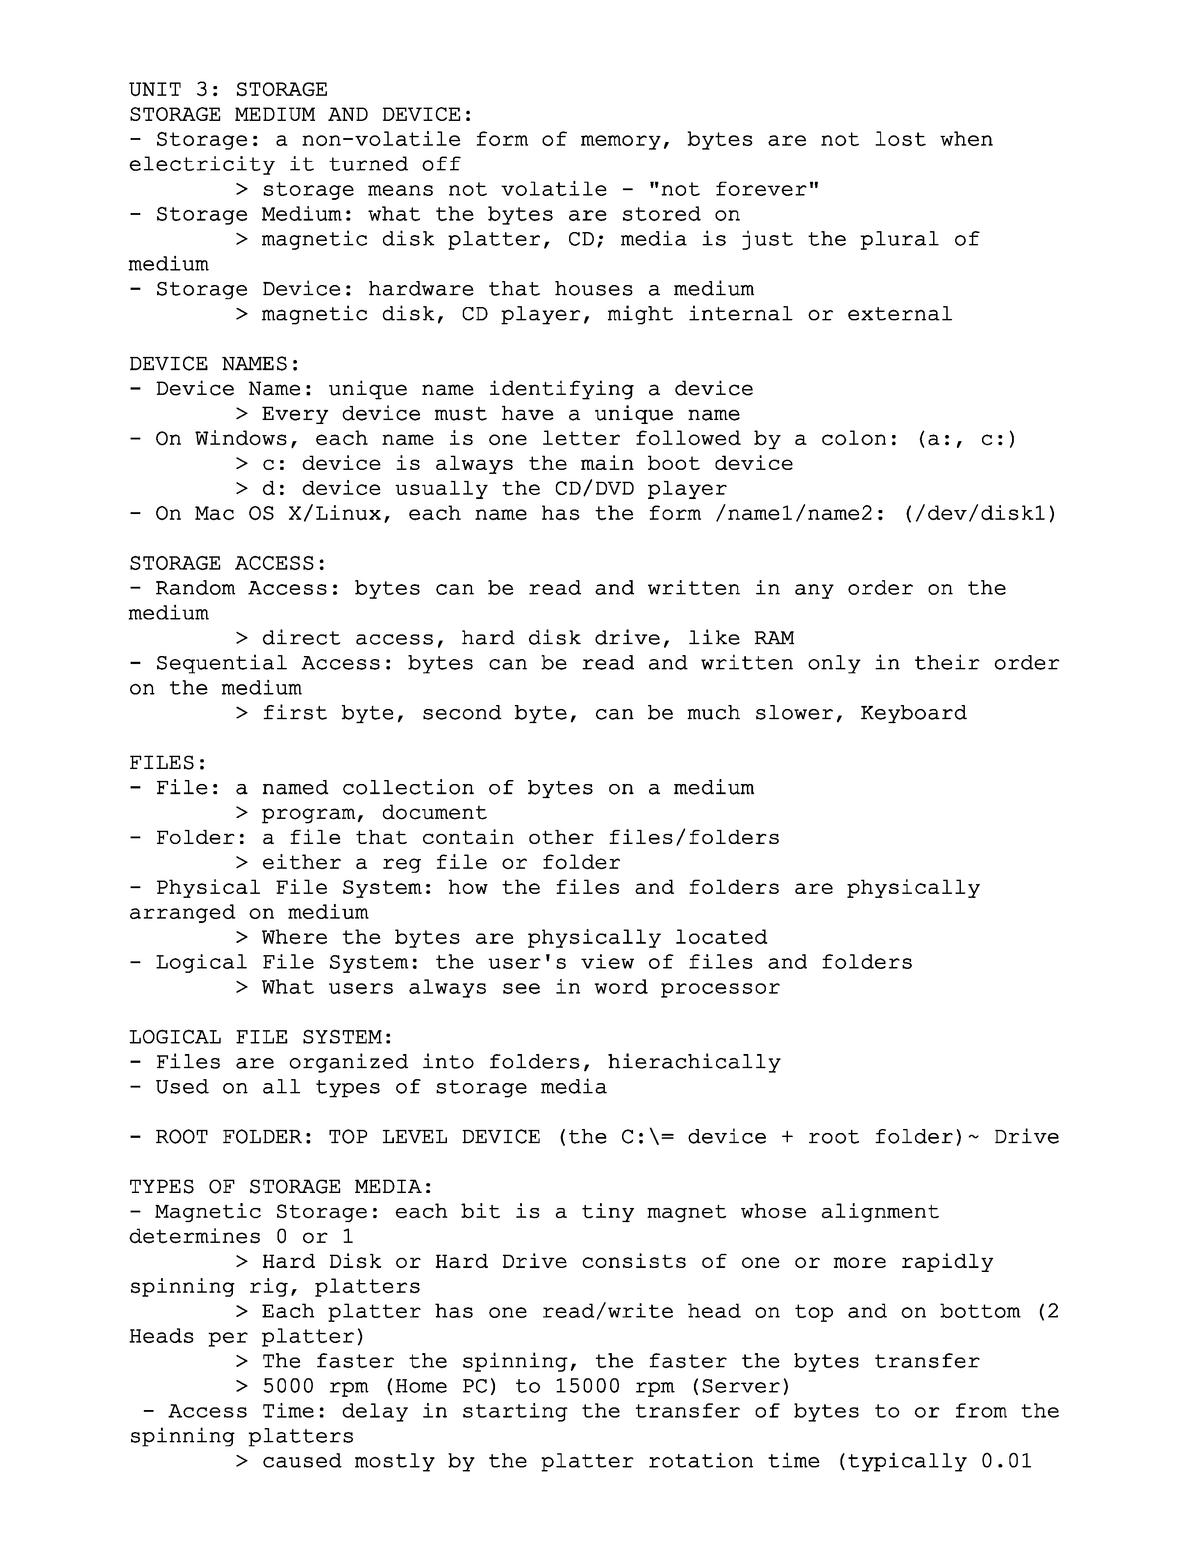 Unit 3 - Exam Material Document Notes - CIS 101 - StuDocu